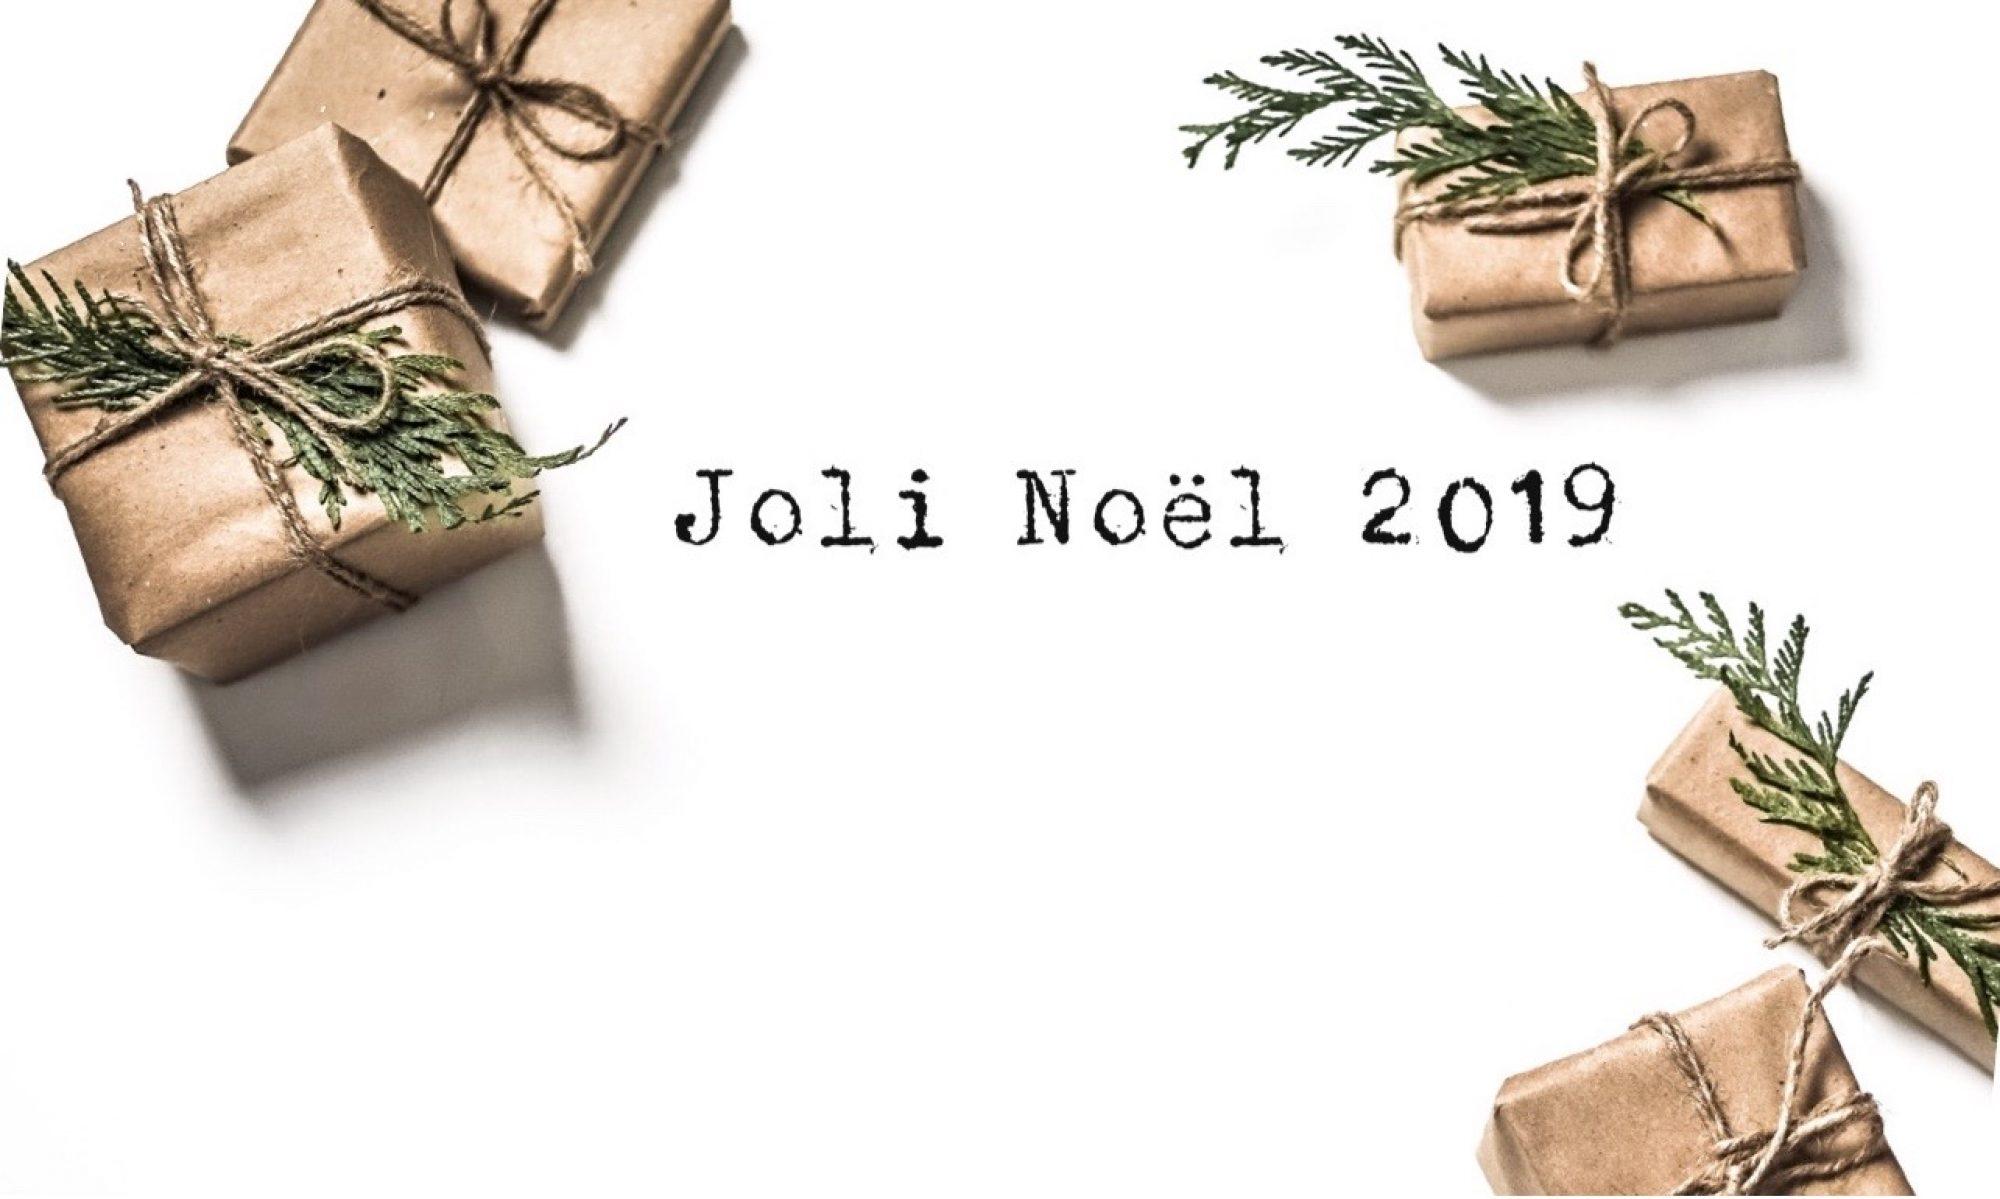 JOLI JOLIE